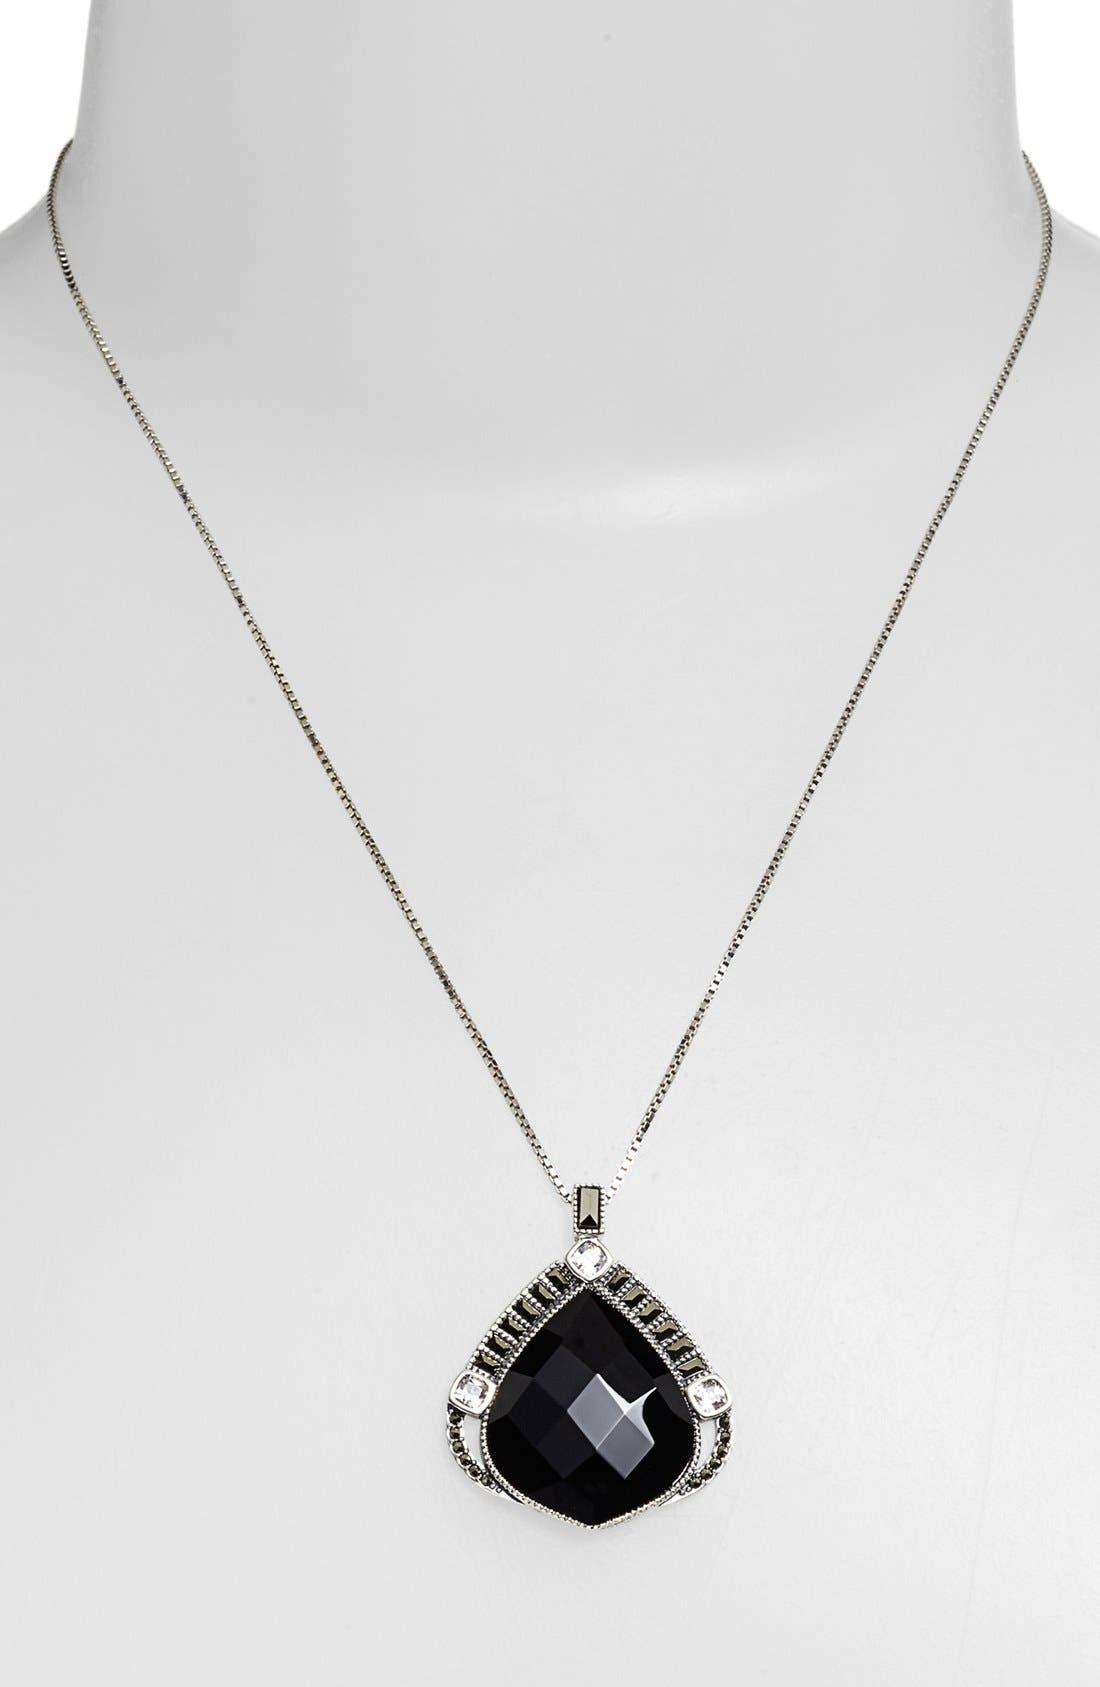 Alternate Image 1 Selected - Judith Jack 'Flamenco' Pendant Necklace